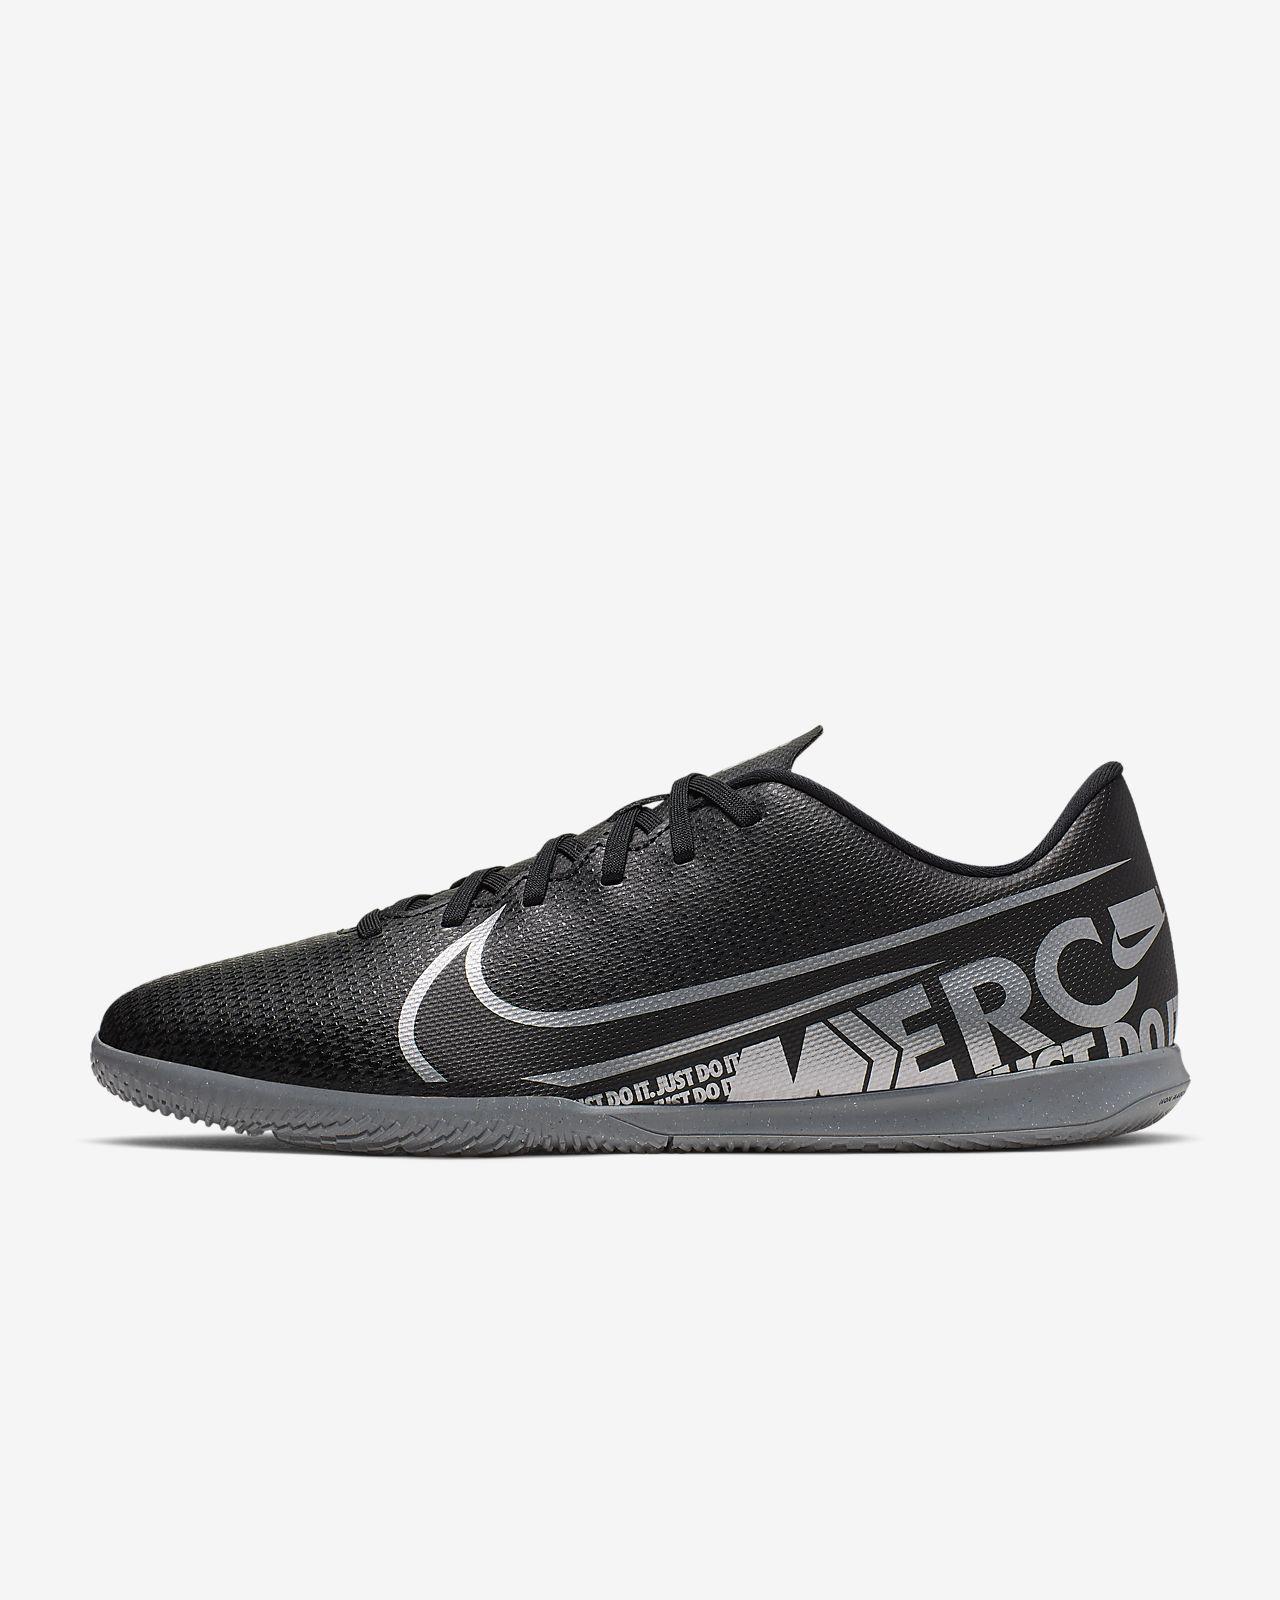 Nike Mercurial Vapor 13 Club IC Indoor Court Football Shoe